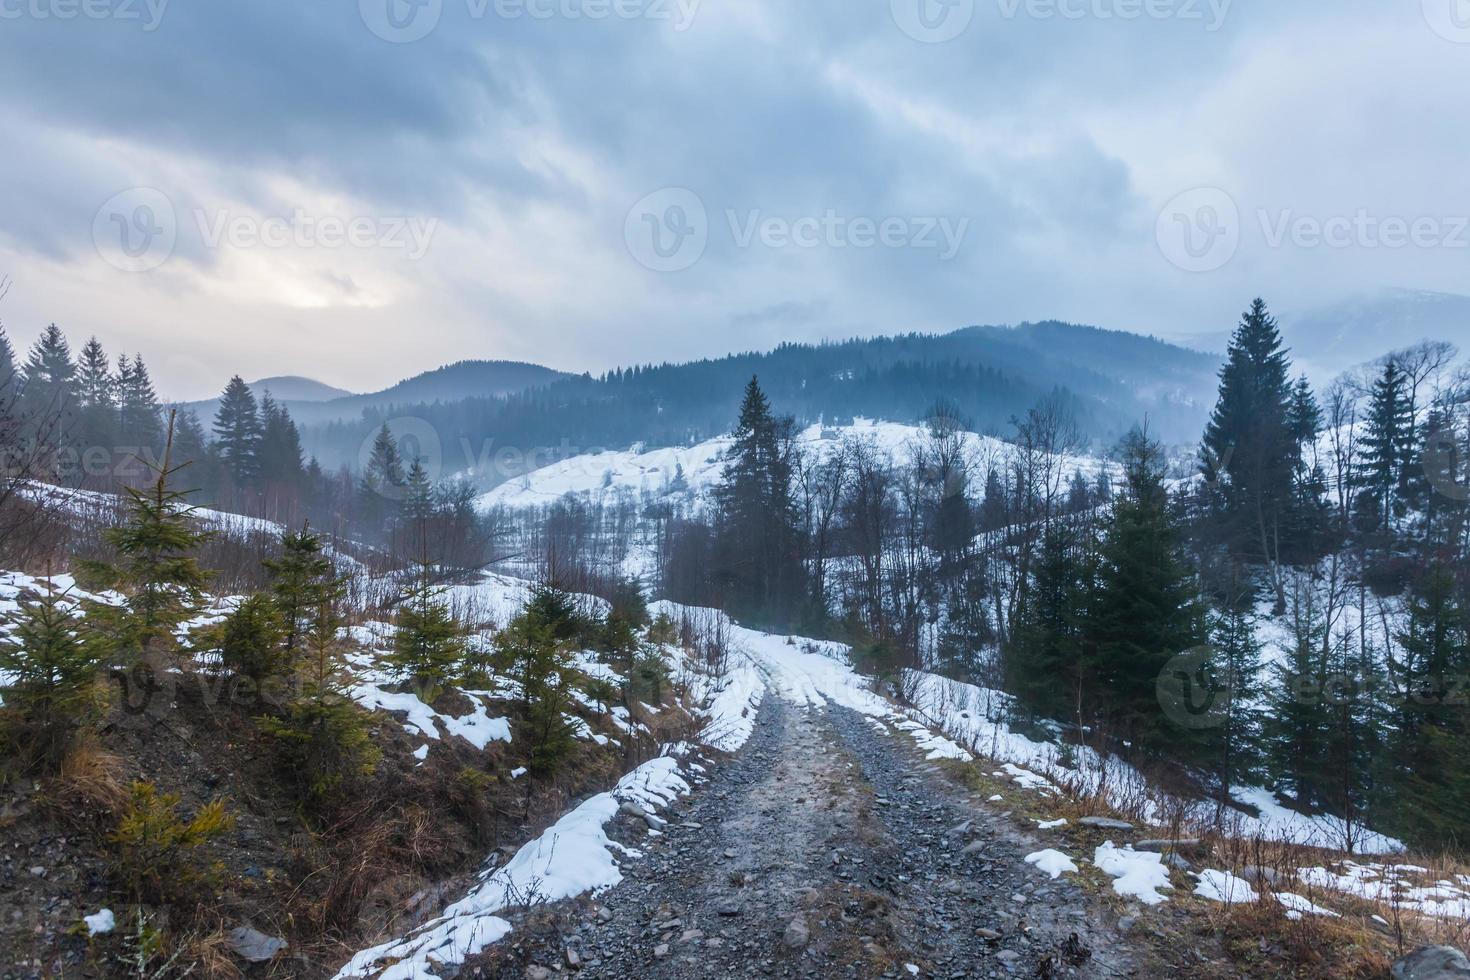 fantastisch winterlandschap. dramatische bewolkte hemel. foto